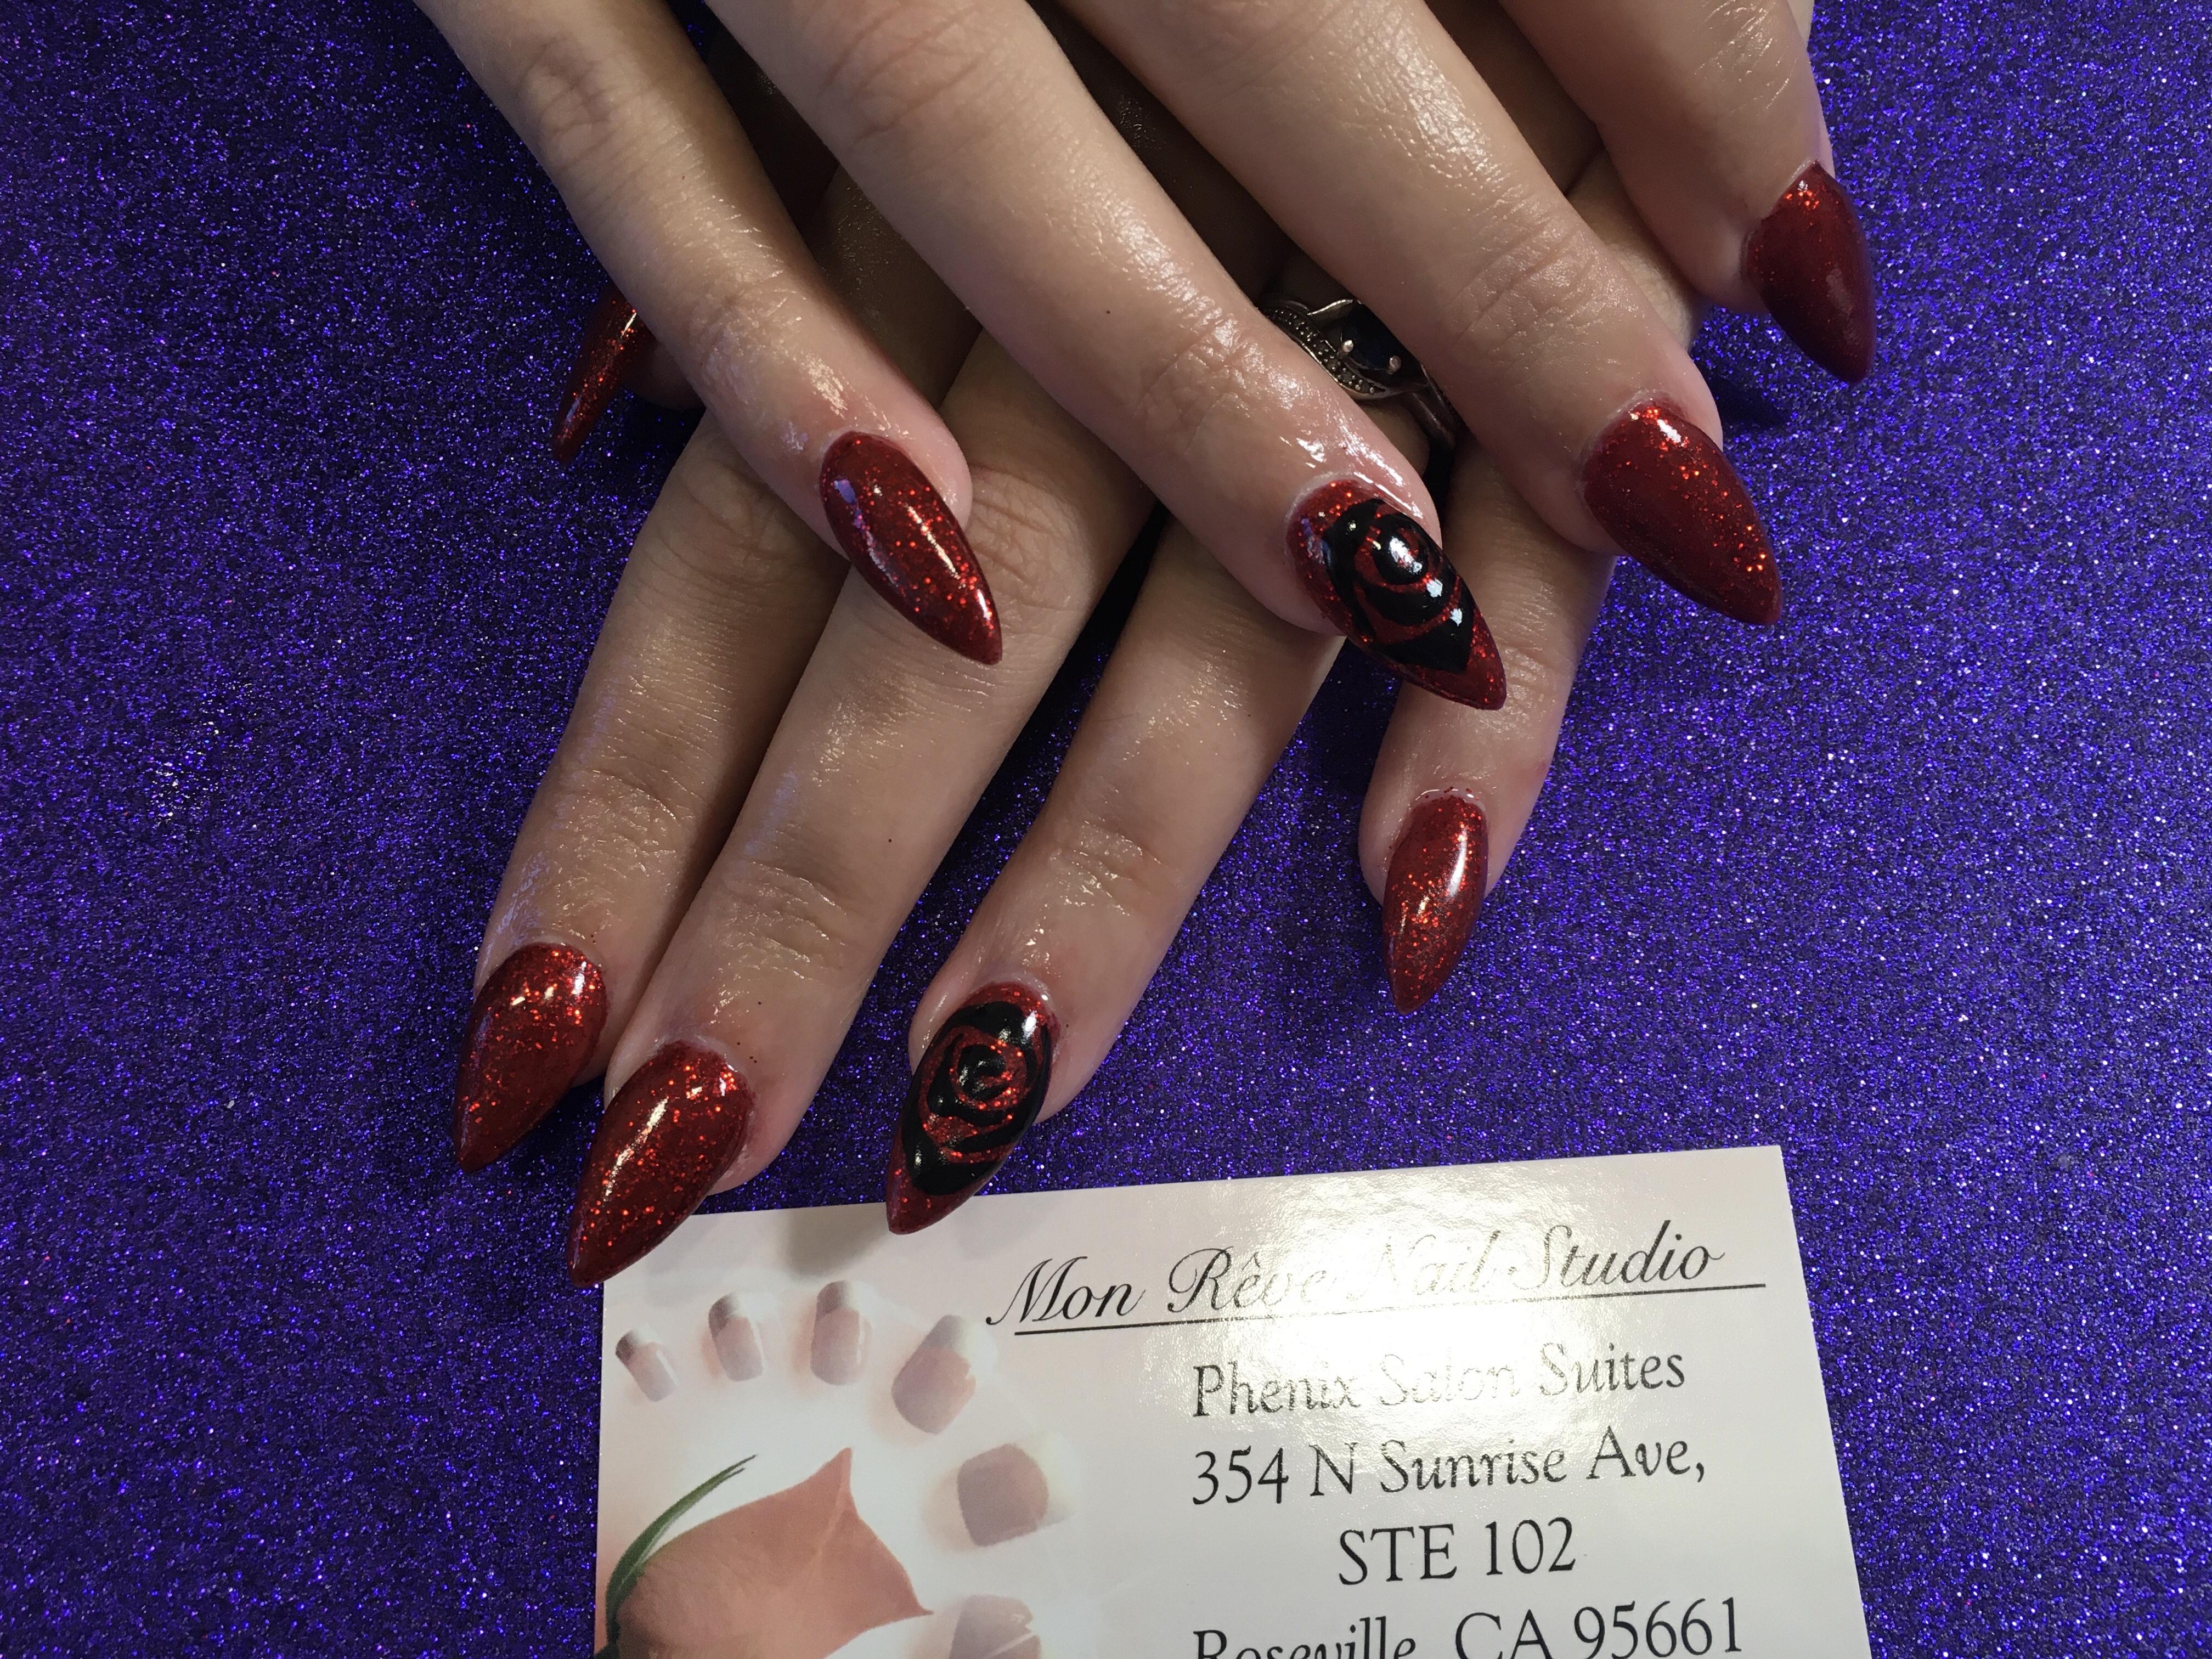 Mon R 234 Ve Nail Studio Acrylic Amp Dip Powder Nails Beauty Pros Near Me